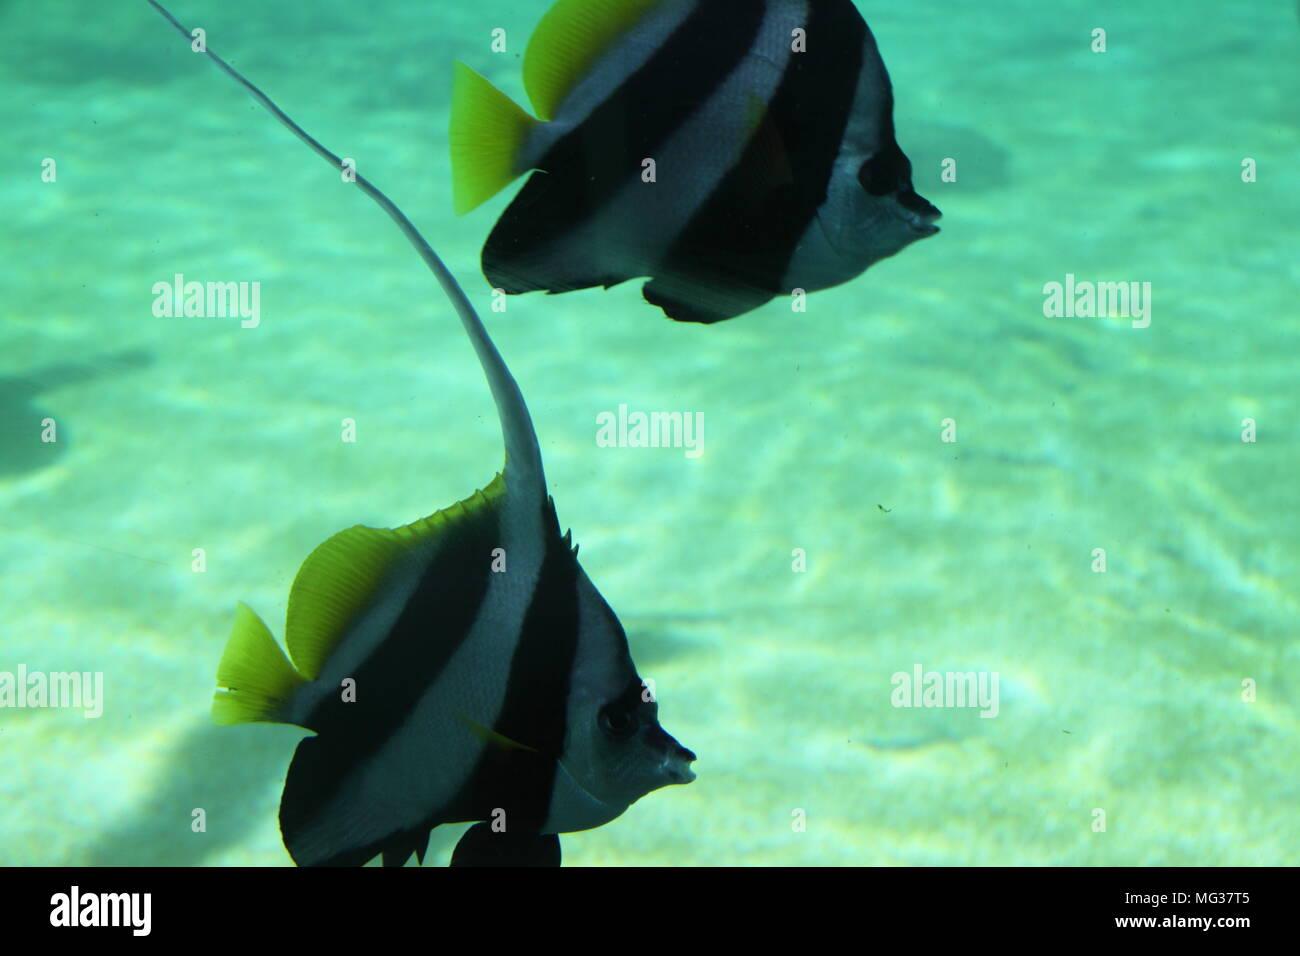 Shoal of Longfin Bannerfish (Heniochus Acuminatus) - Stock Image